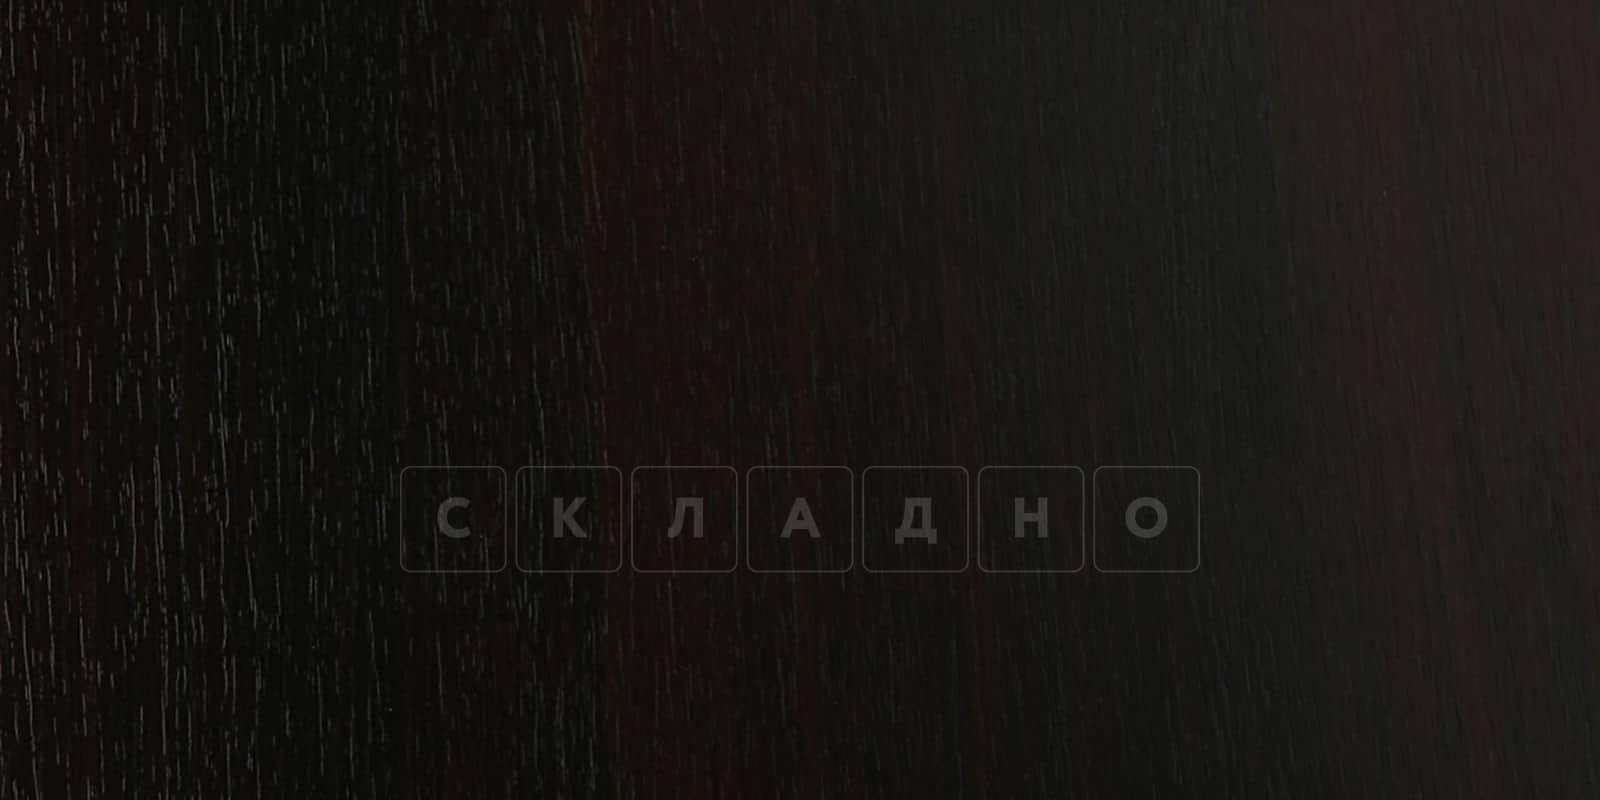 Прикроватная тумба Юлианна фото 4 | интернет-магазин Складно